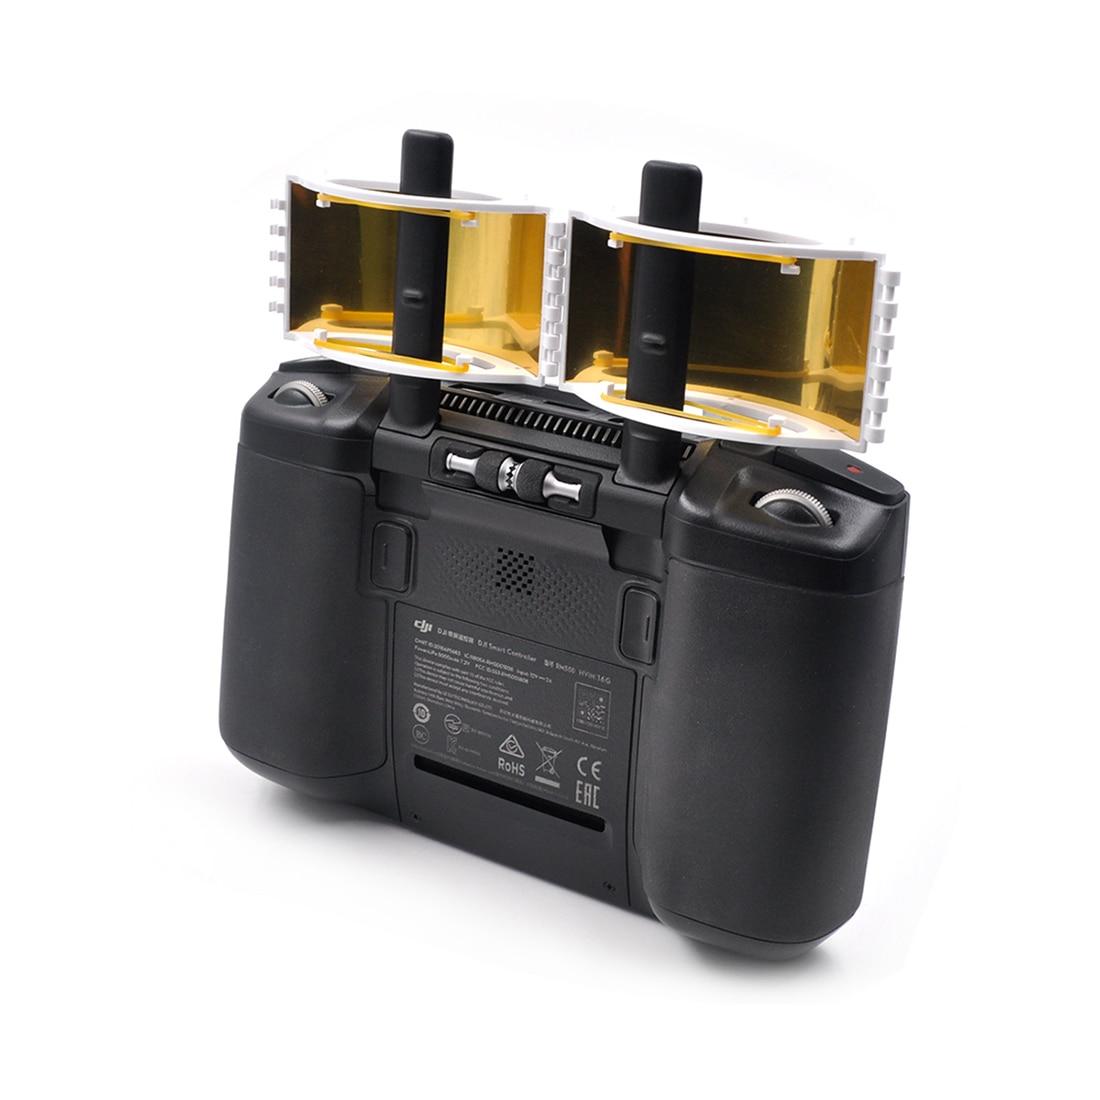 1Pair Antenna Signal Booster Antenna Range Extender For